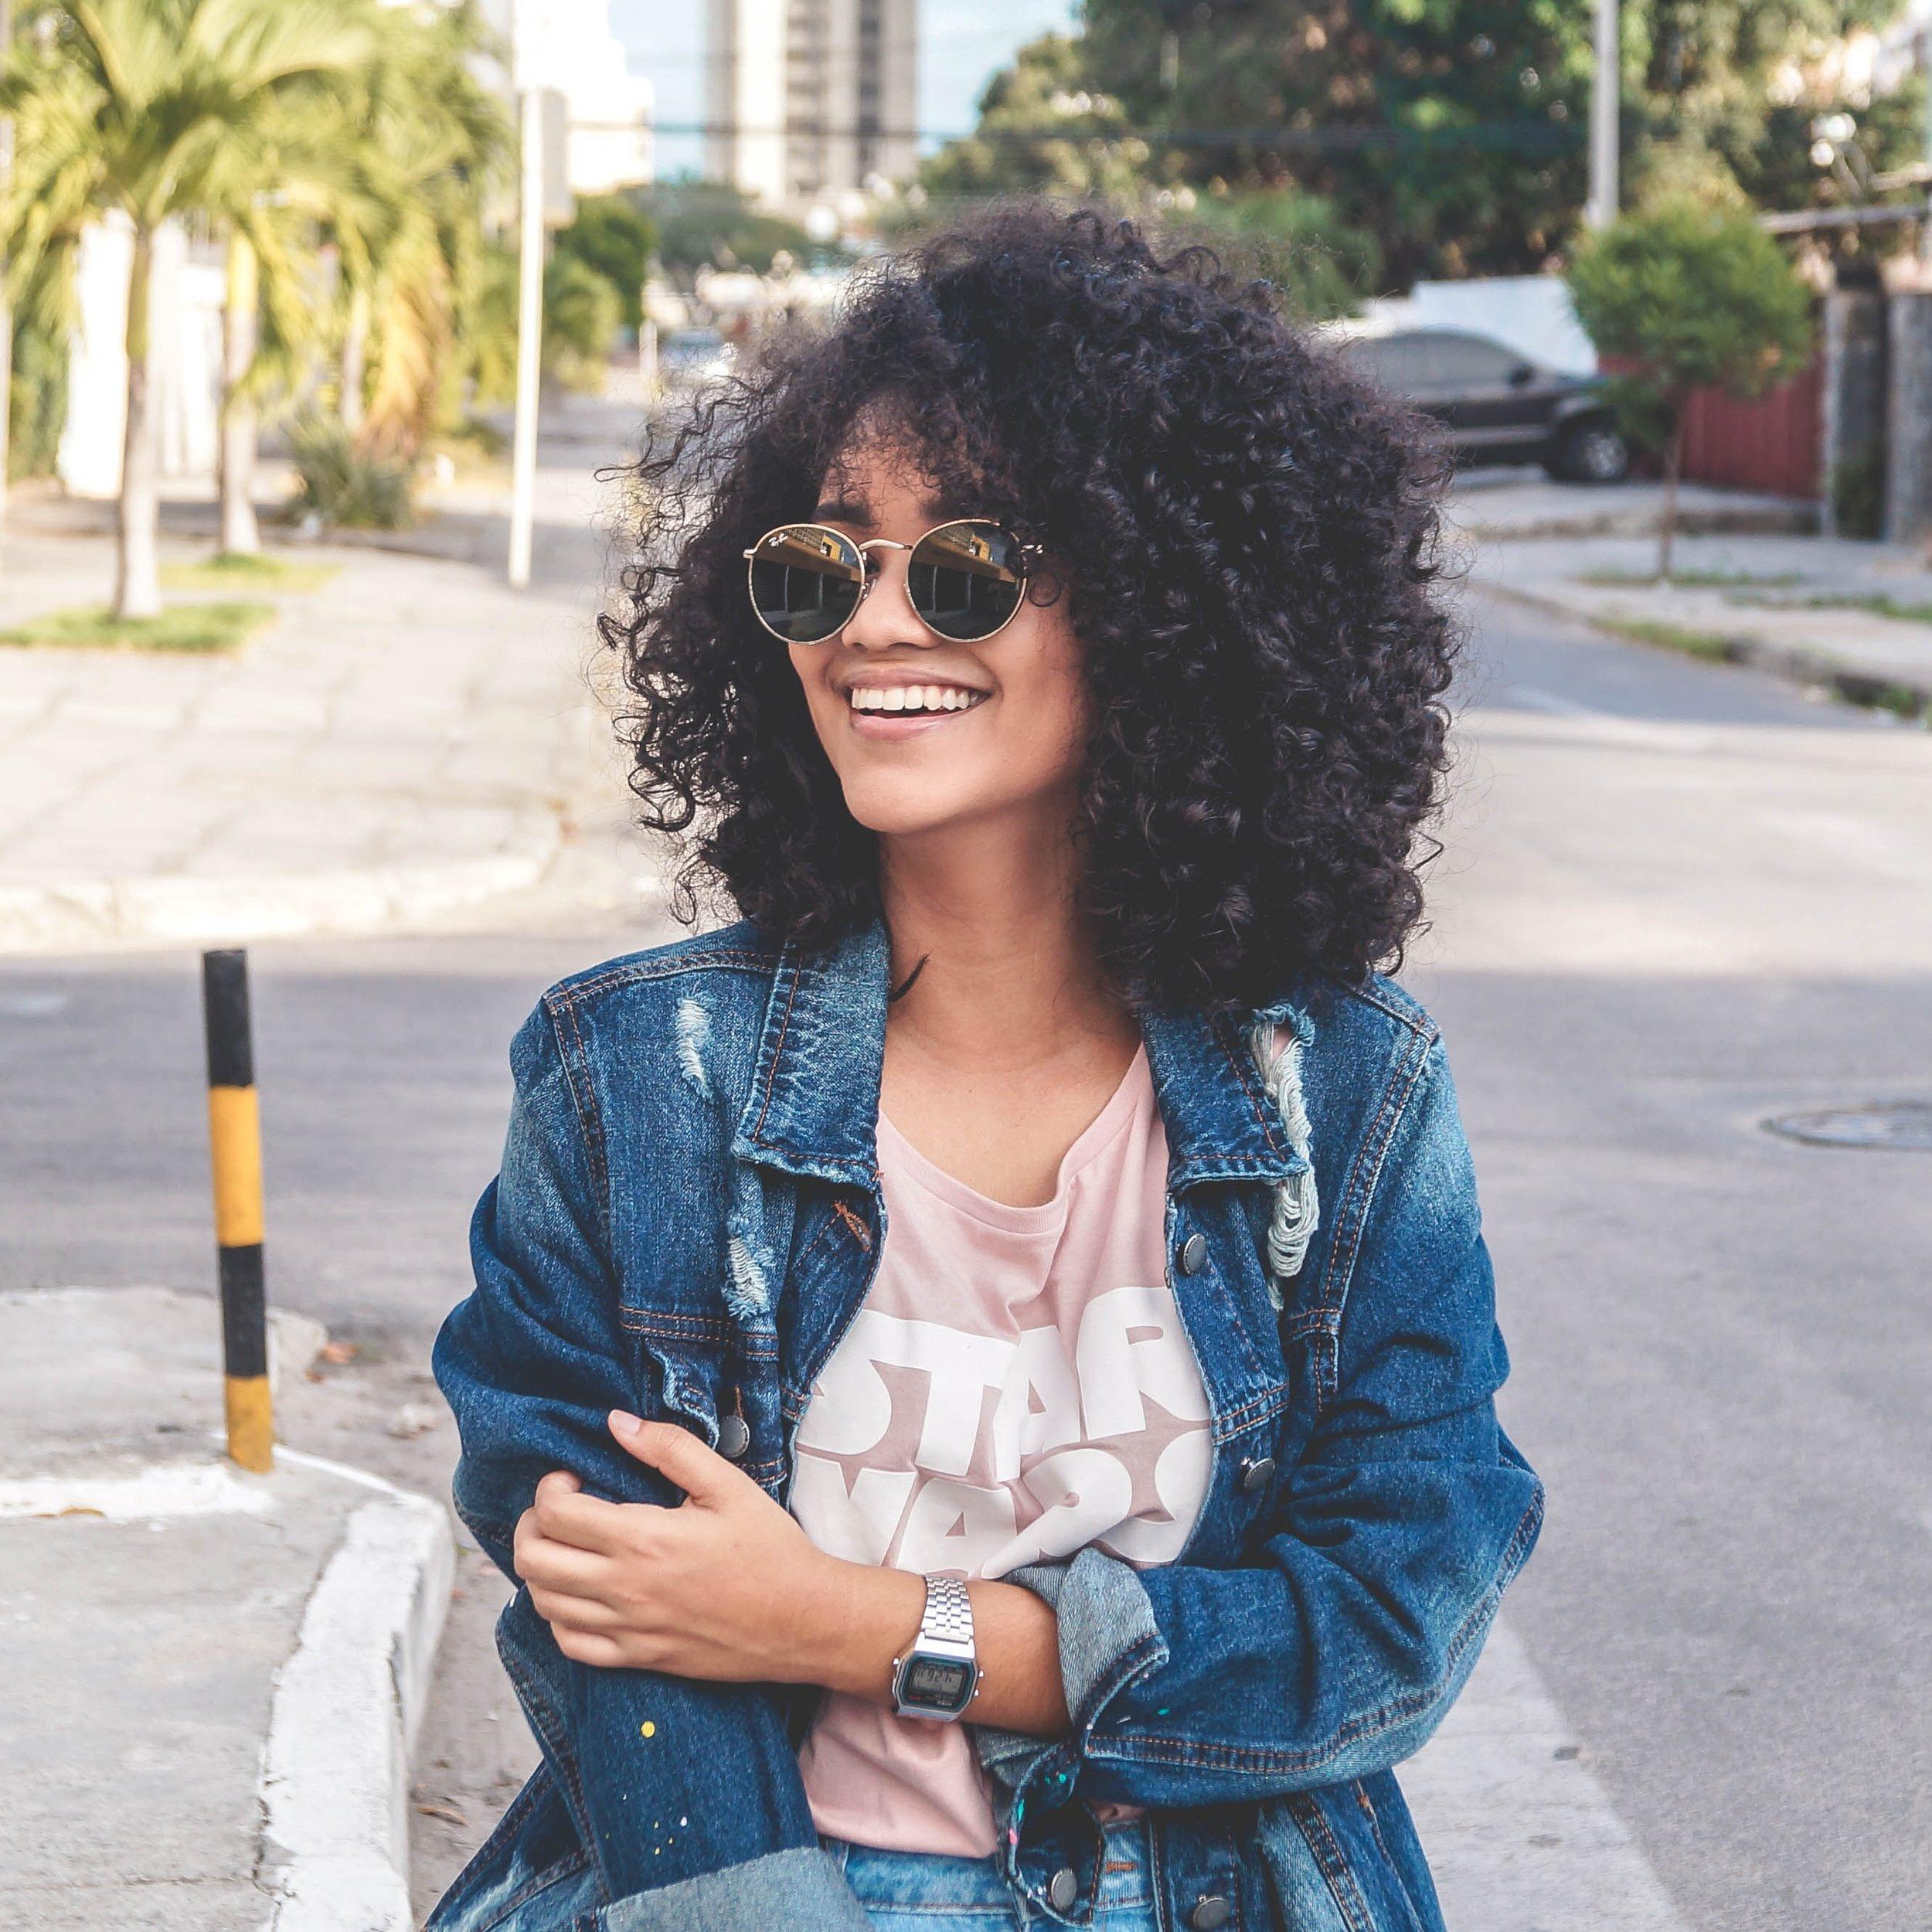 sunglasses-woman.jpg